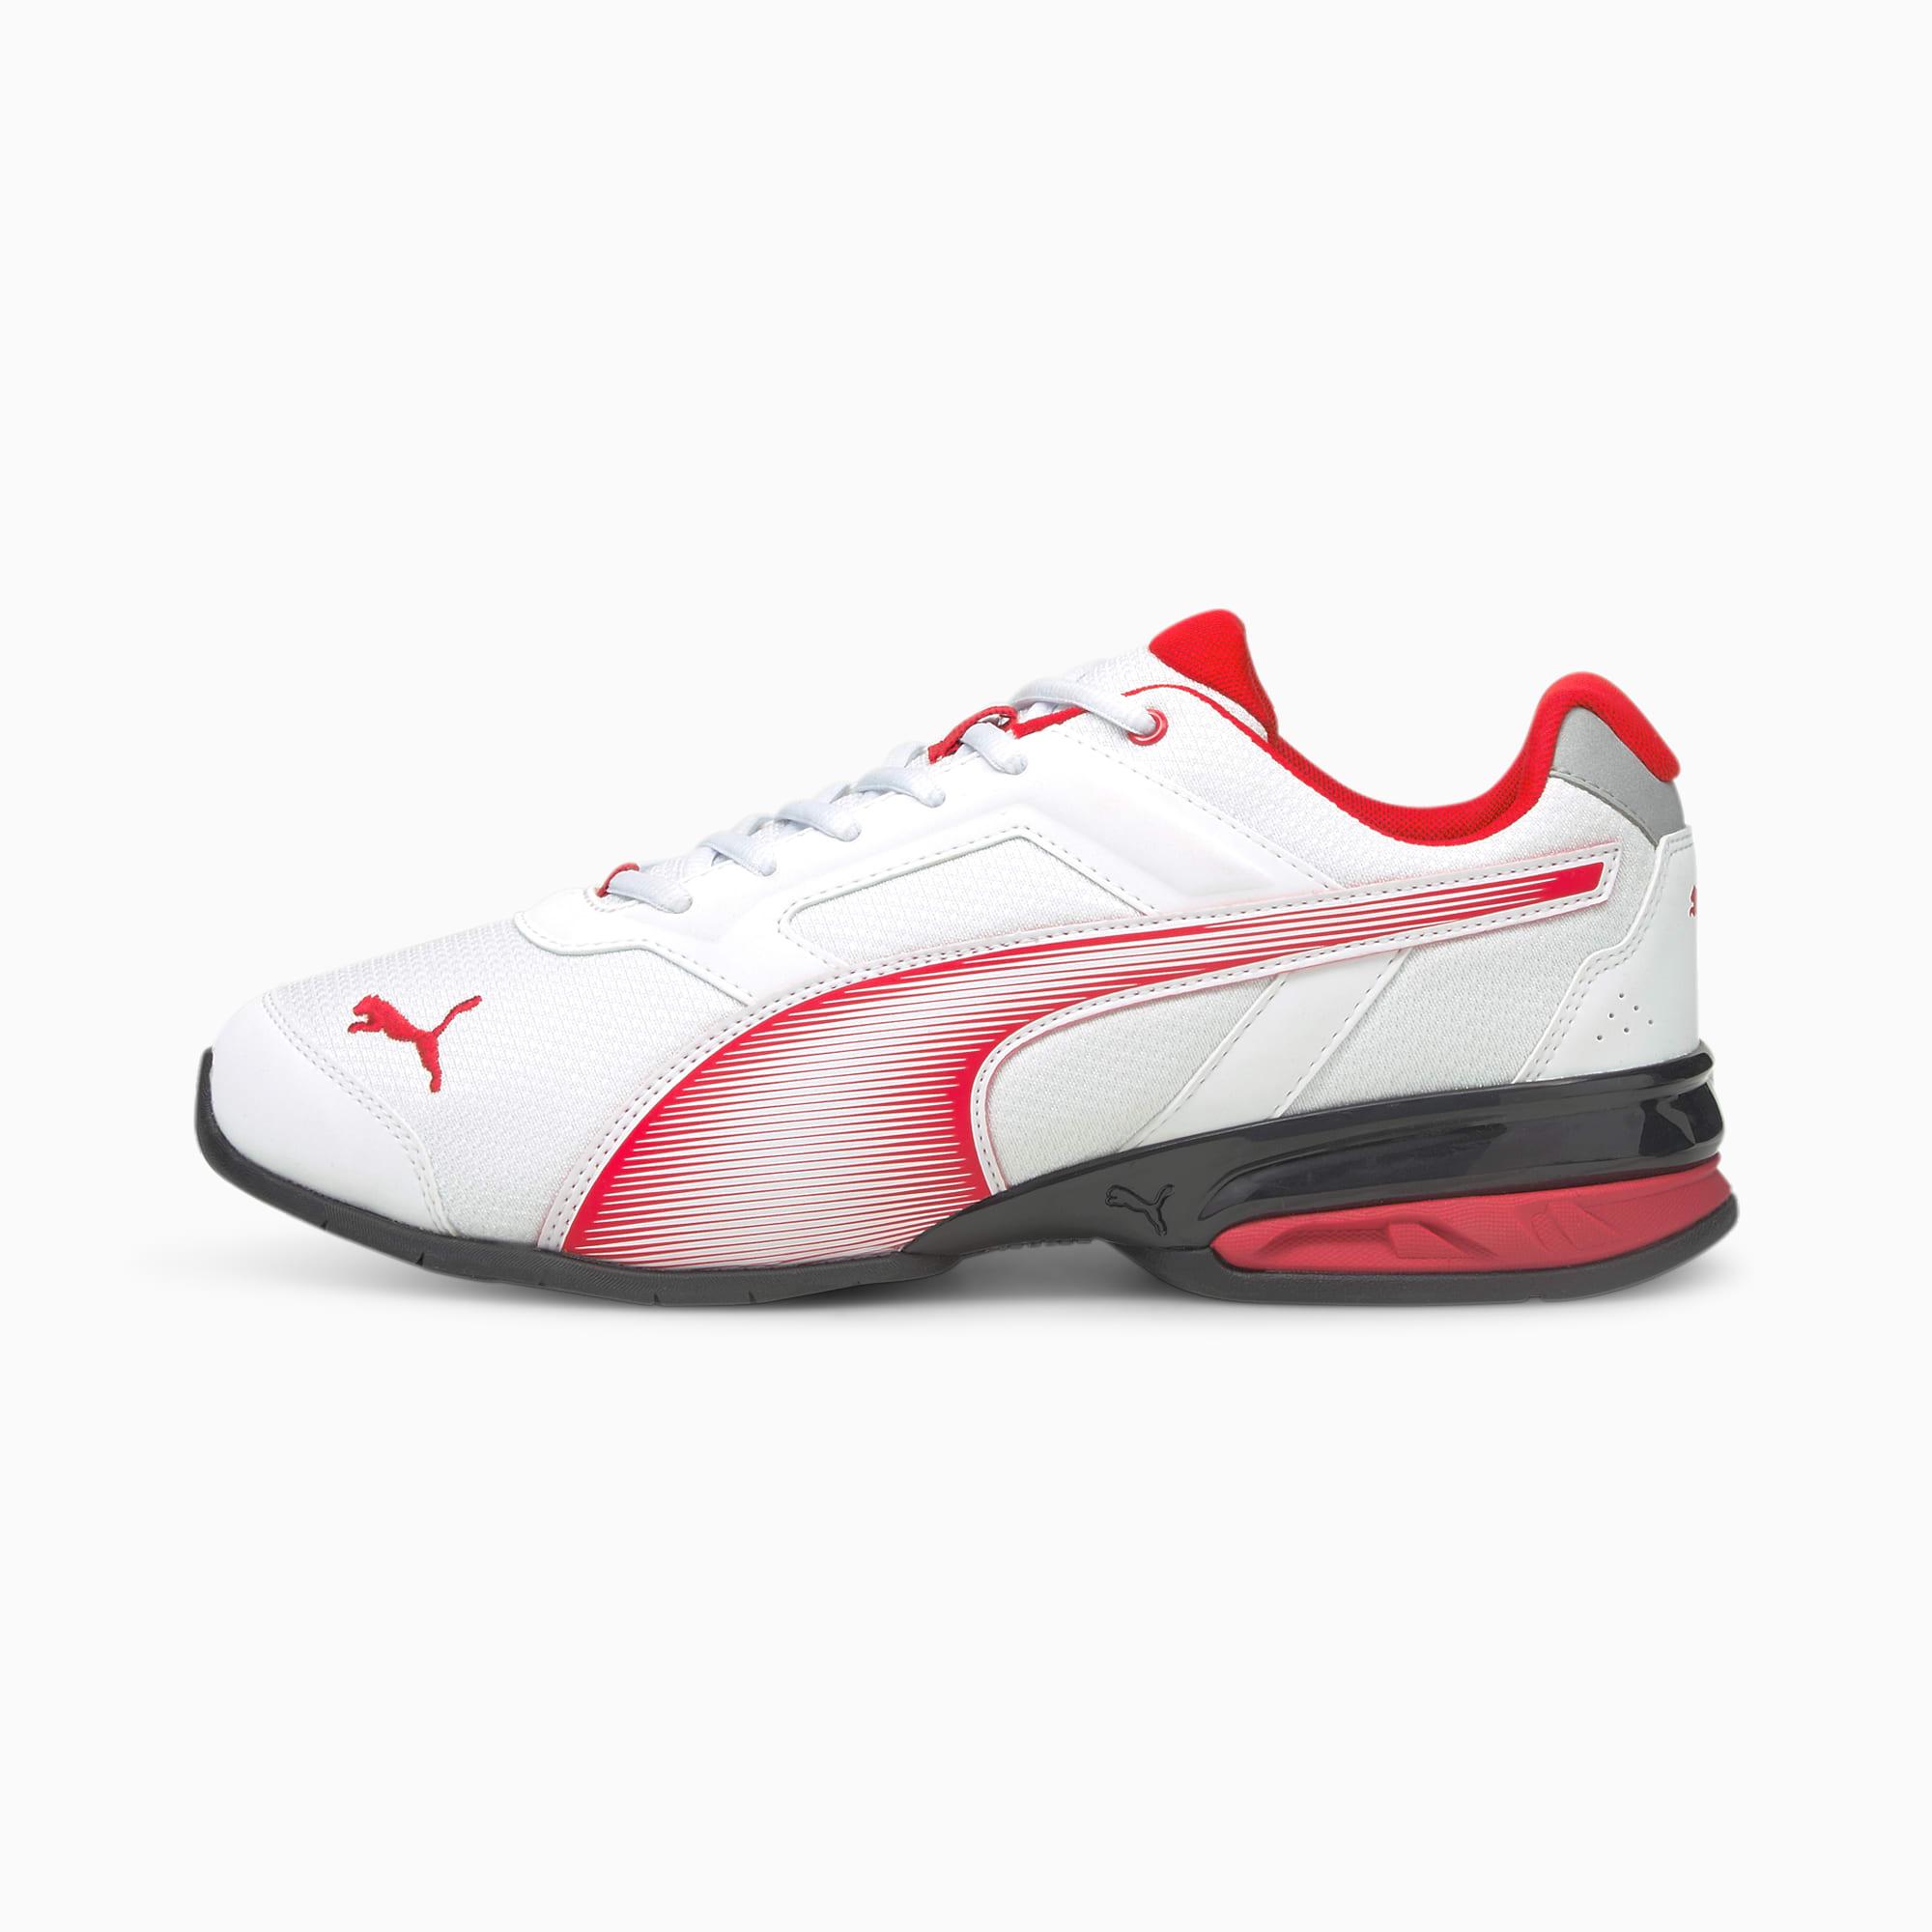 Tazon 7 Running Sneakers